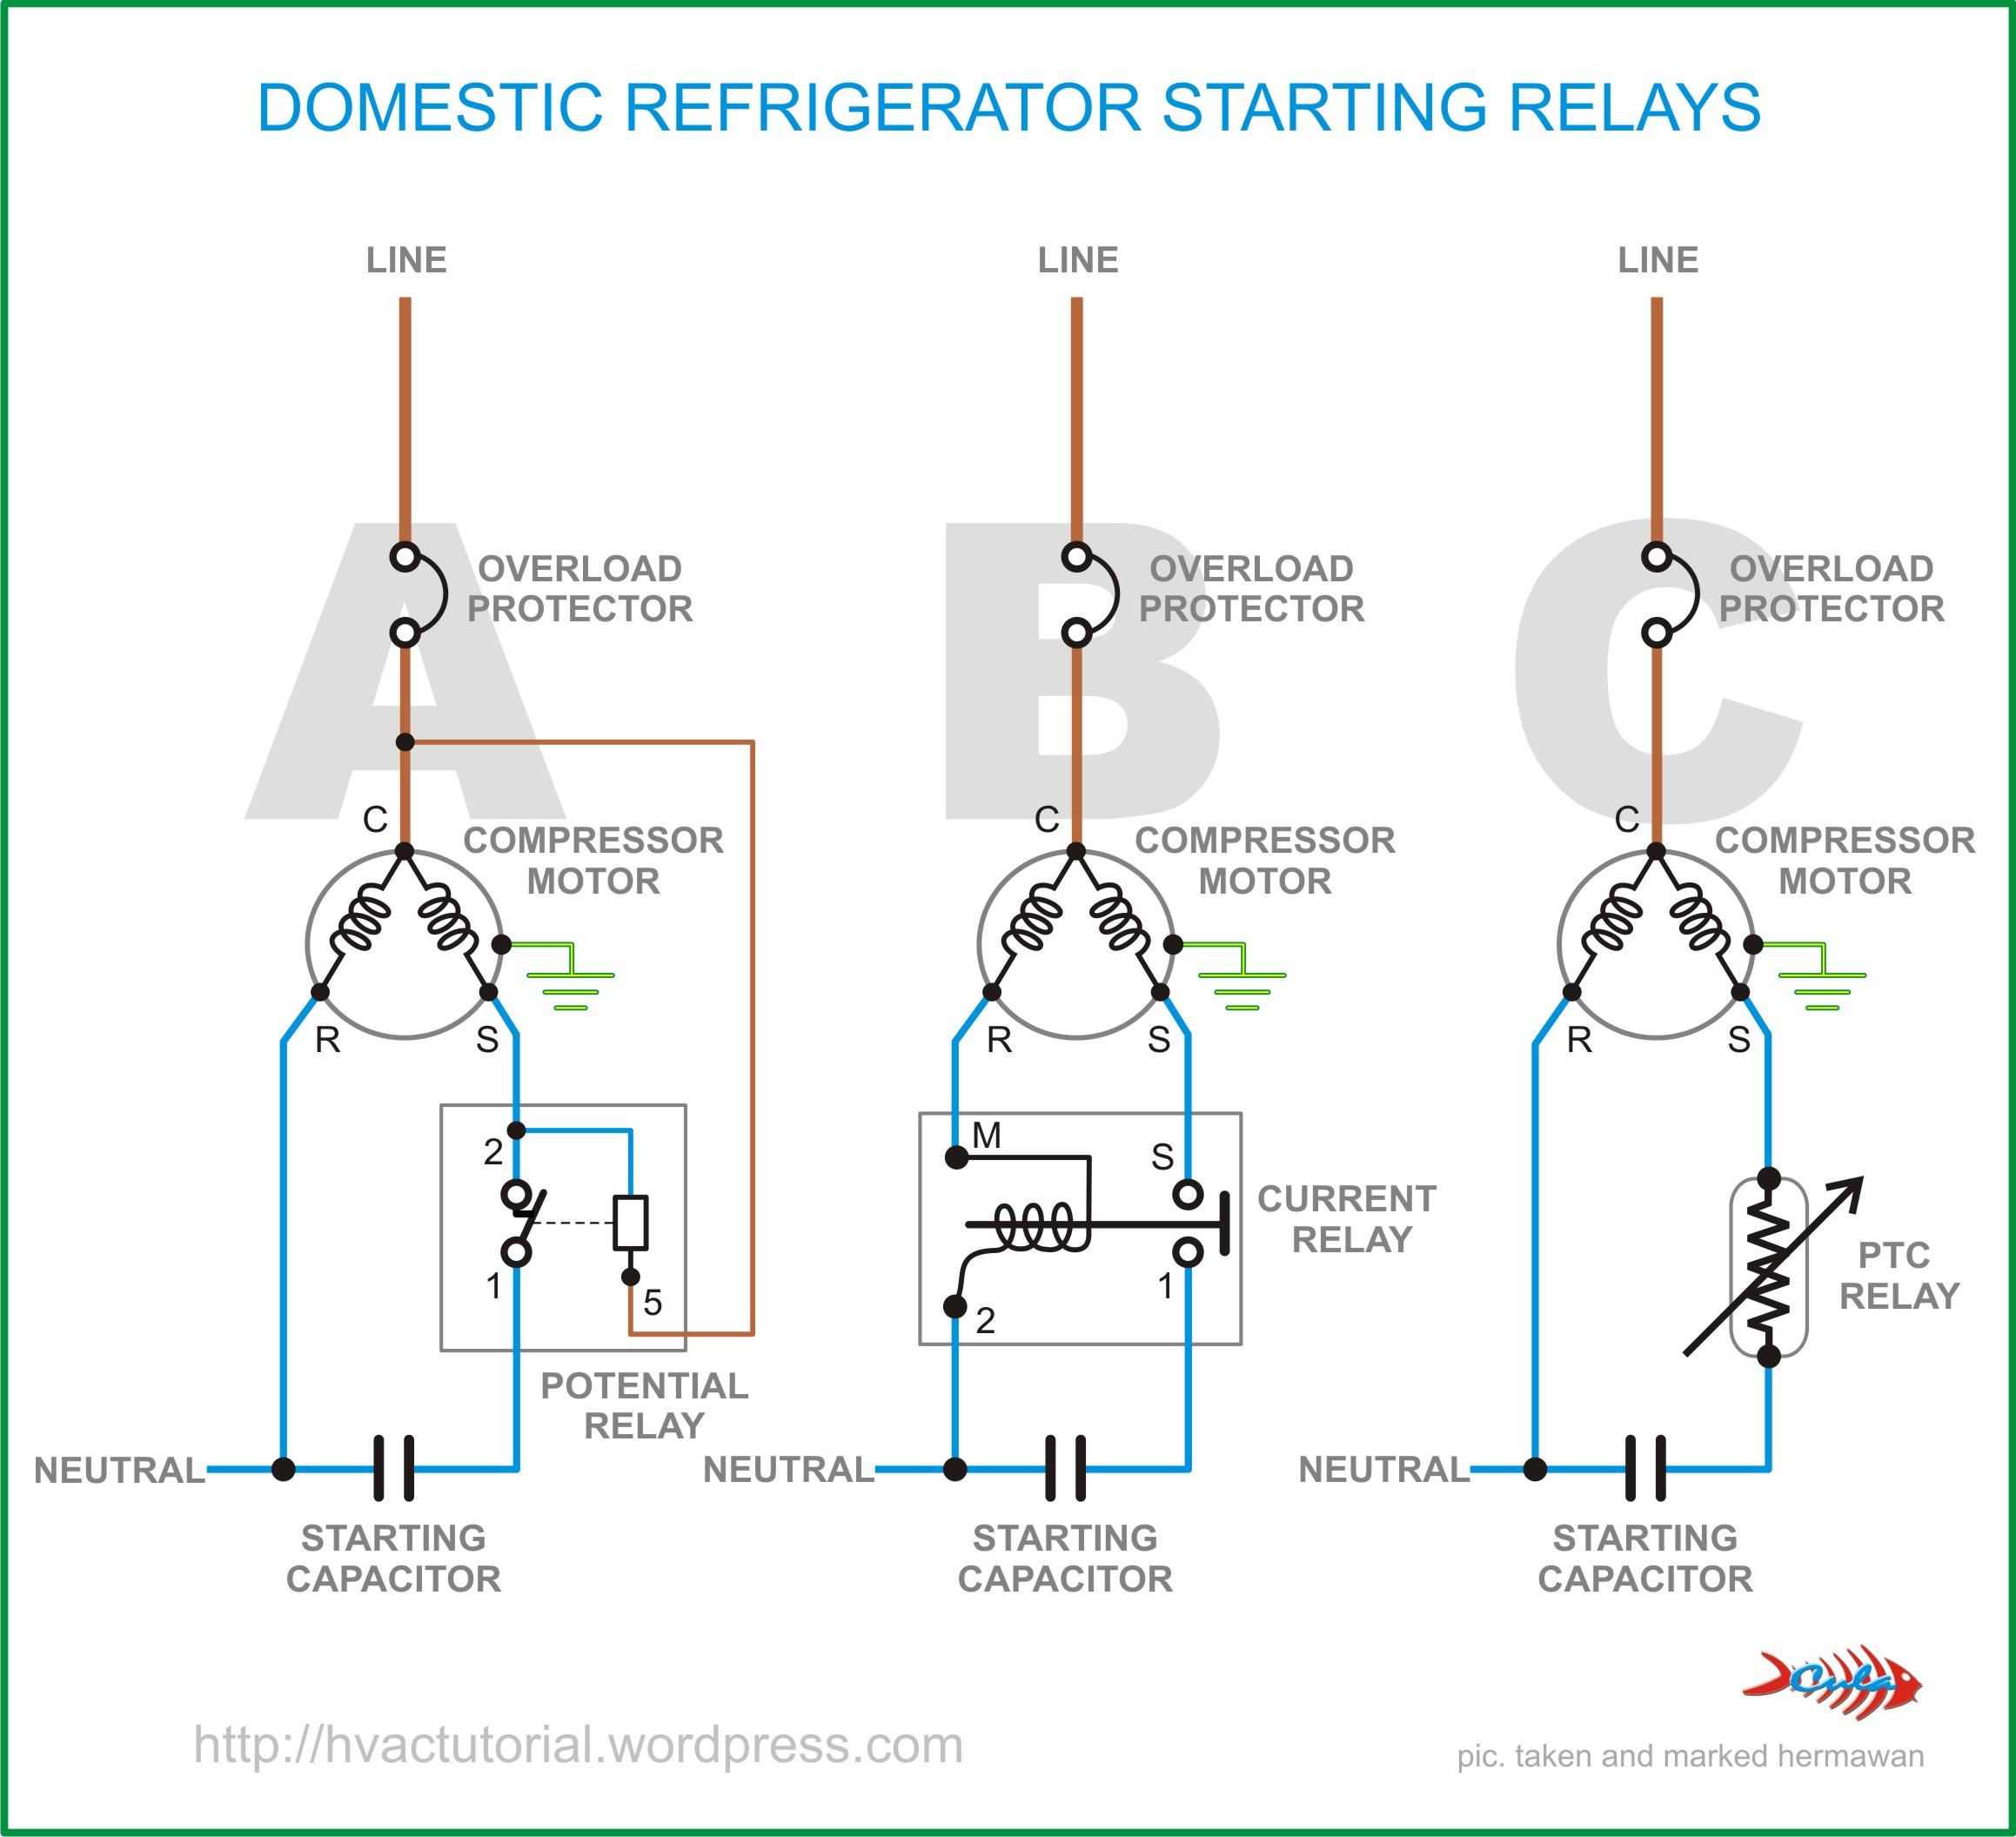 Domestic Refrigerator Starting Relays | Hermawan's Blog - Refrigerator Start Relay Wiring Diagram